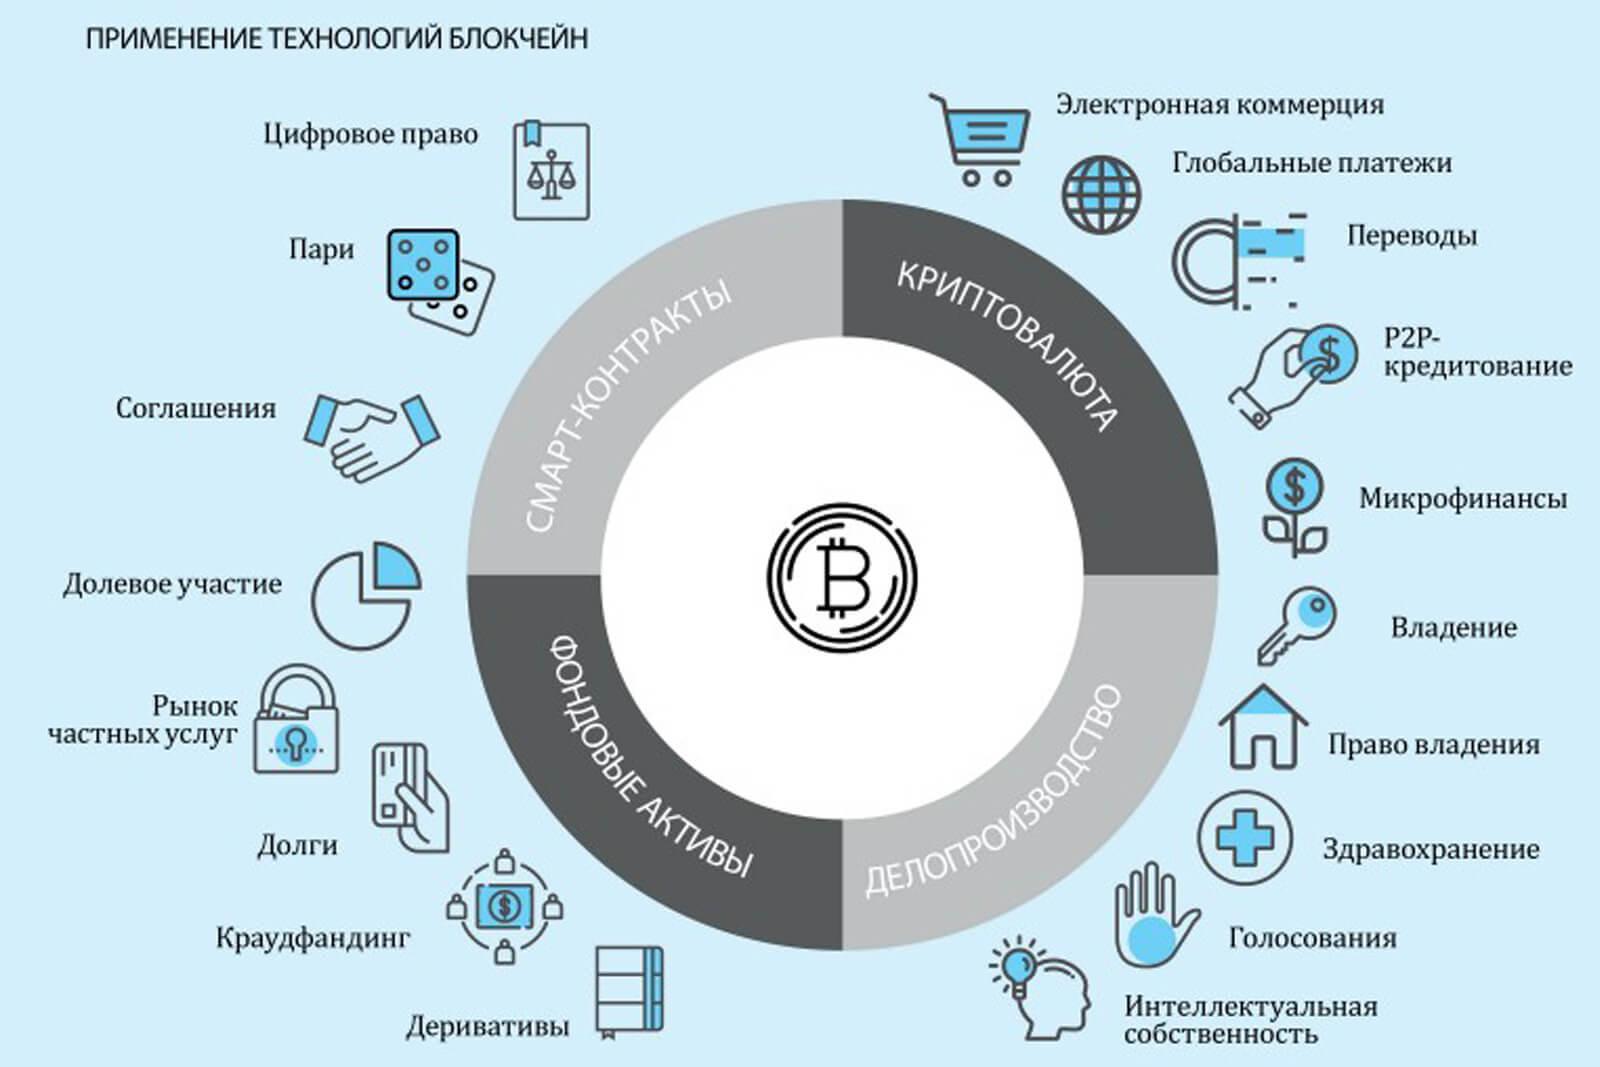 Перспективы блокчейн ТЕХНОЛОГИЙ